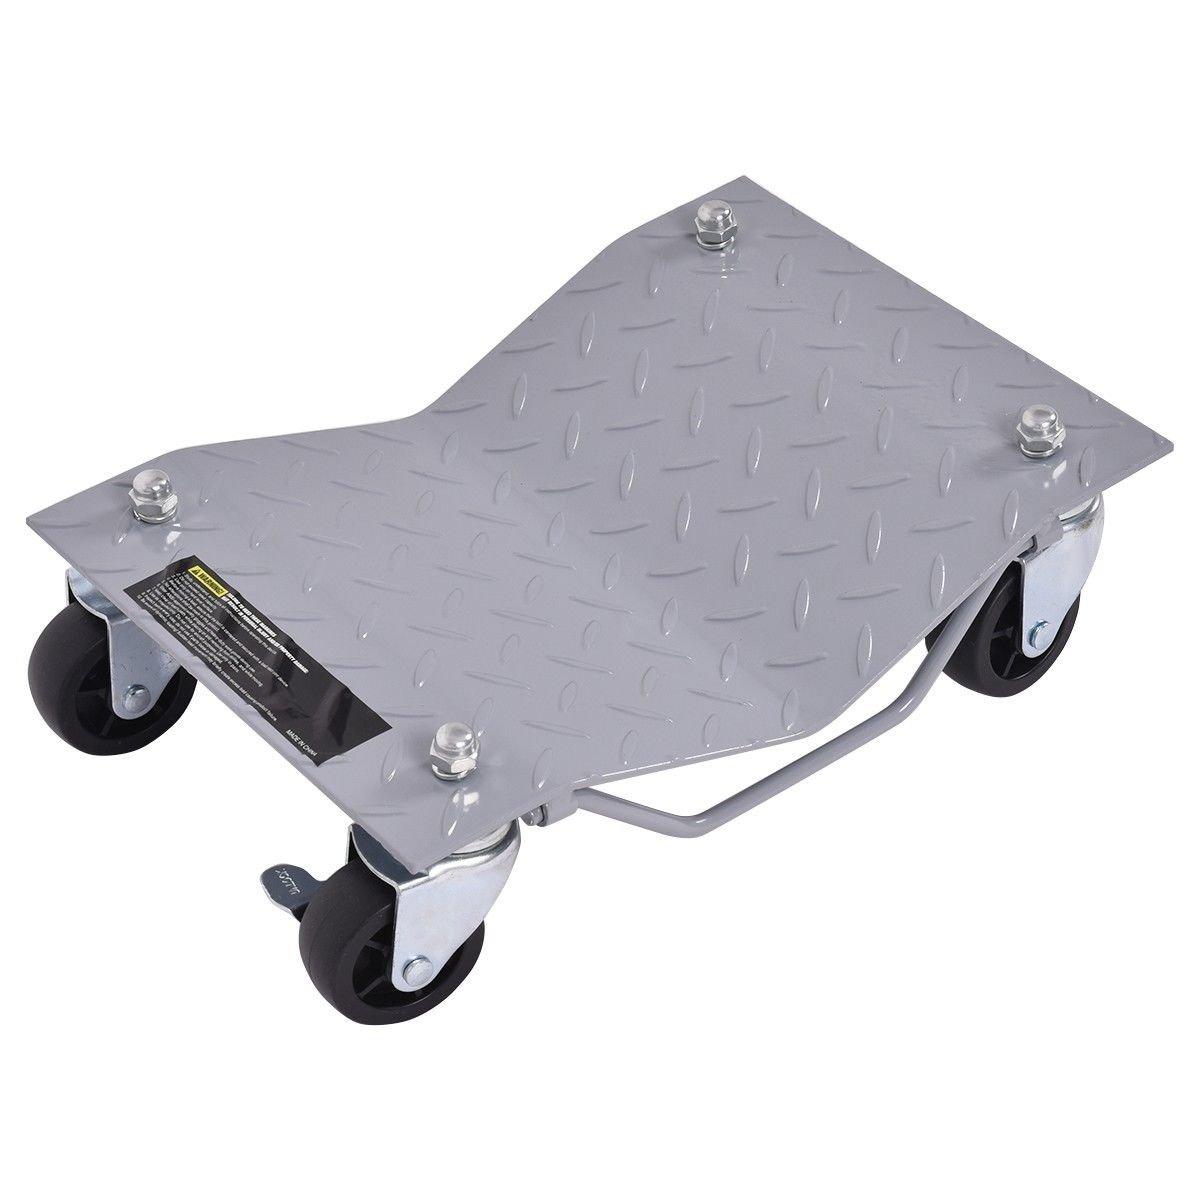 Goplus 4 PCS 4 X 3 Set Wheel Dollies Dolly Tire Skates Vehicle Car Auto Repair Moving Diamond Gray